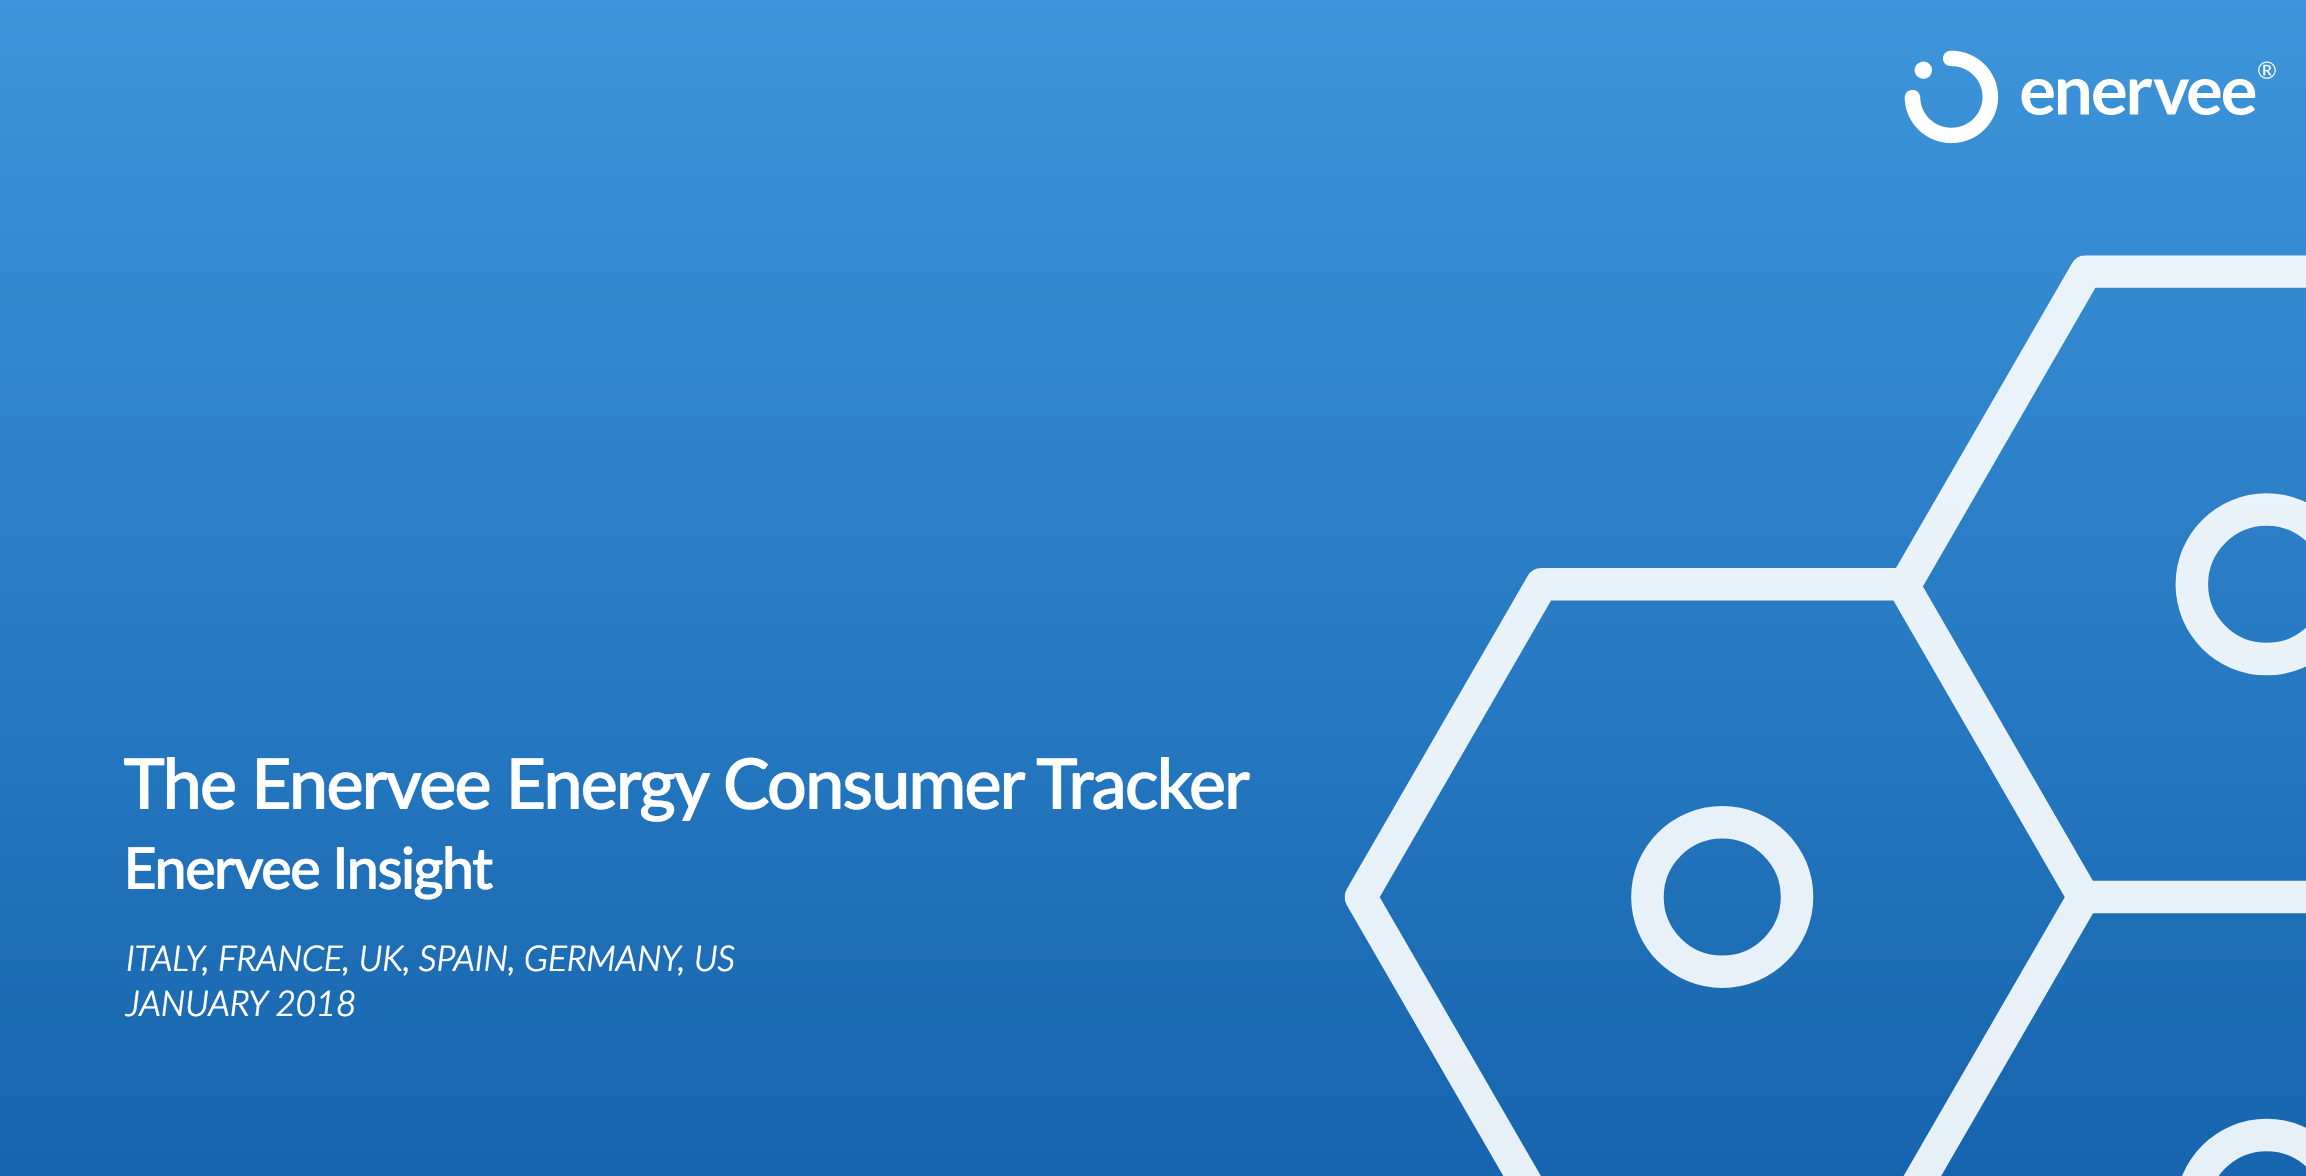 The Enervee Energy Consumer Tracker